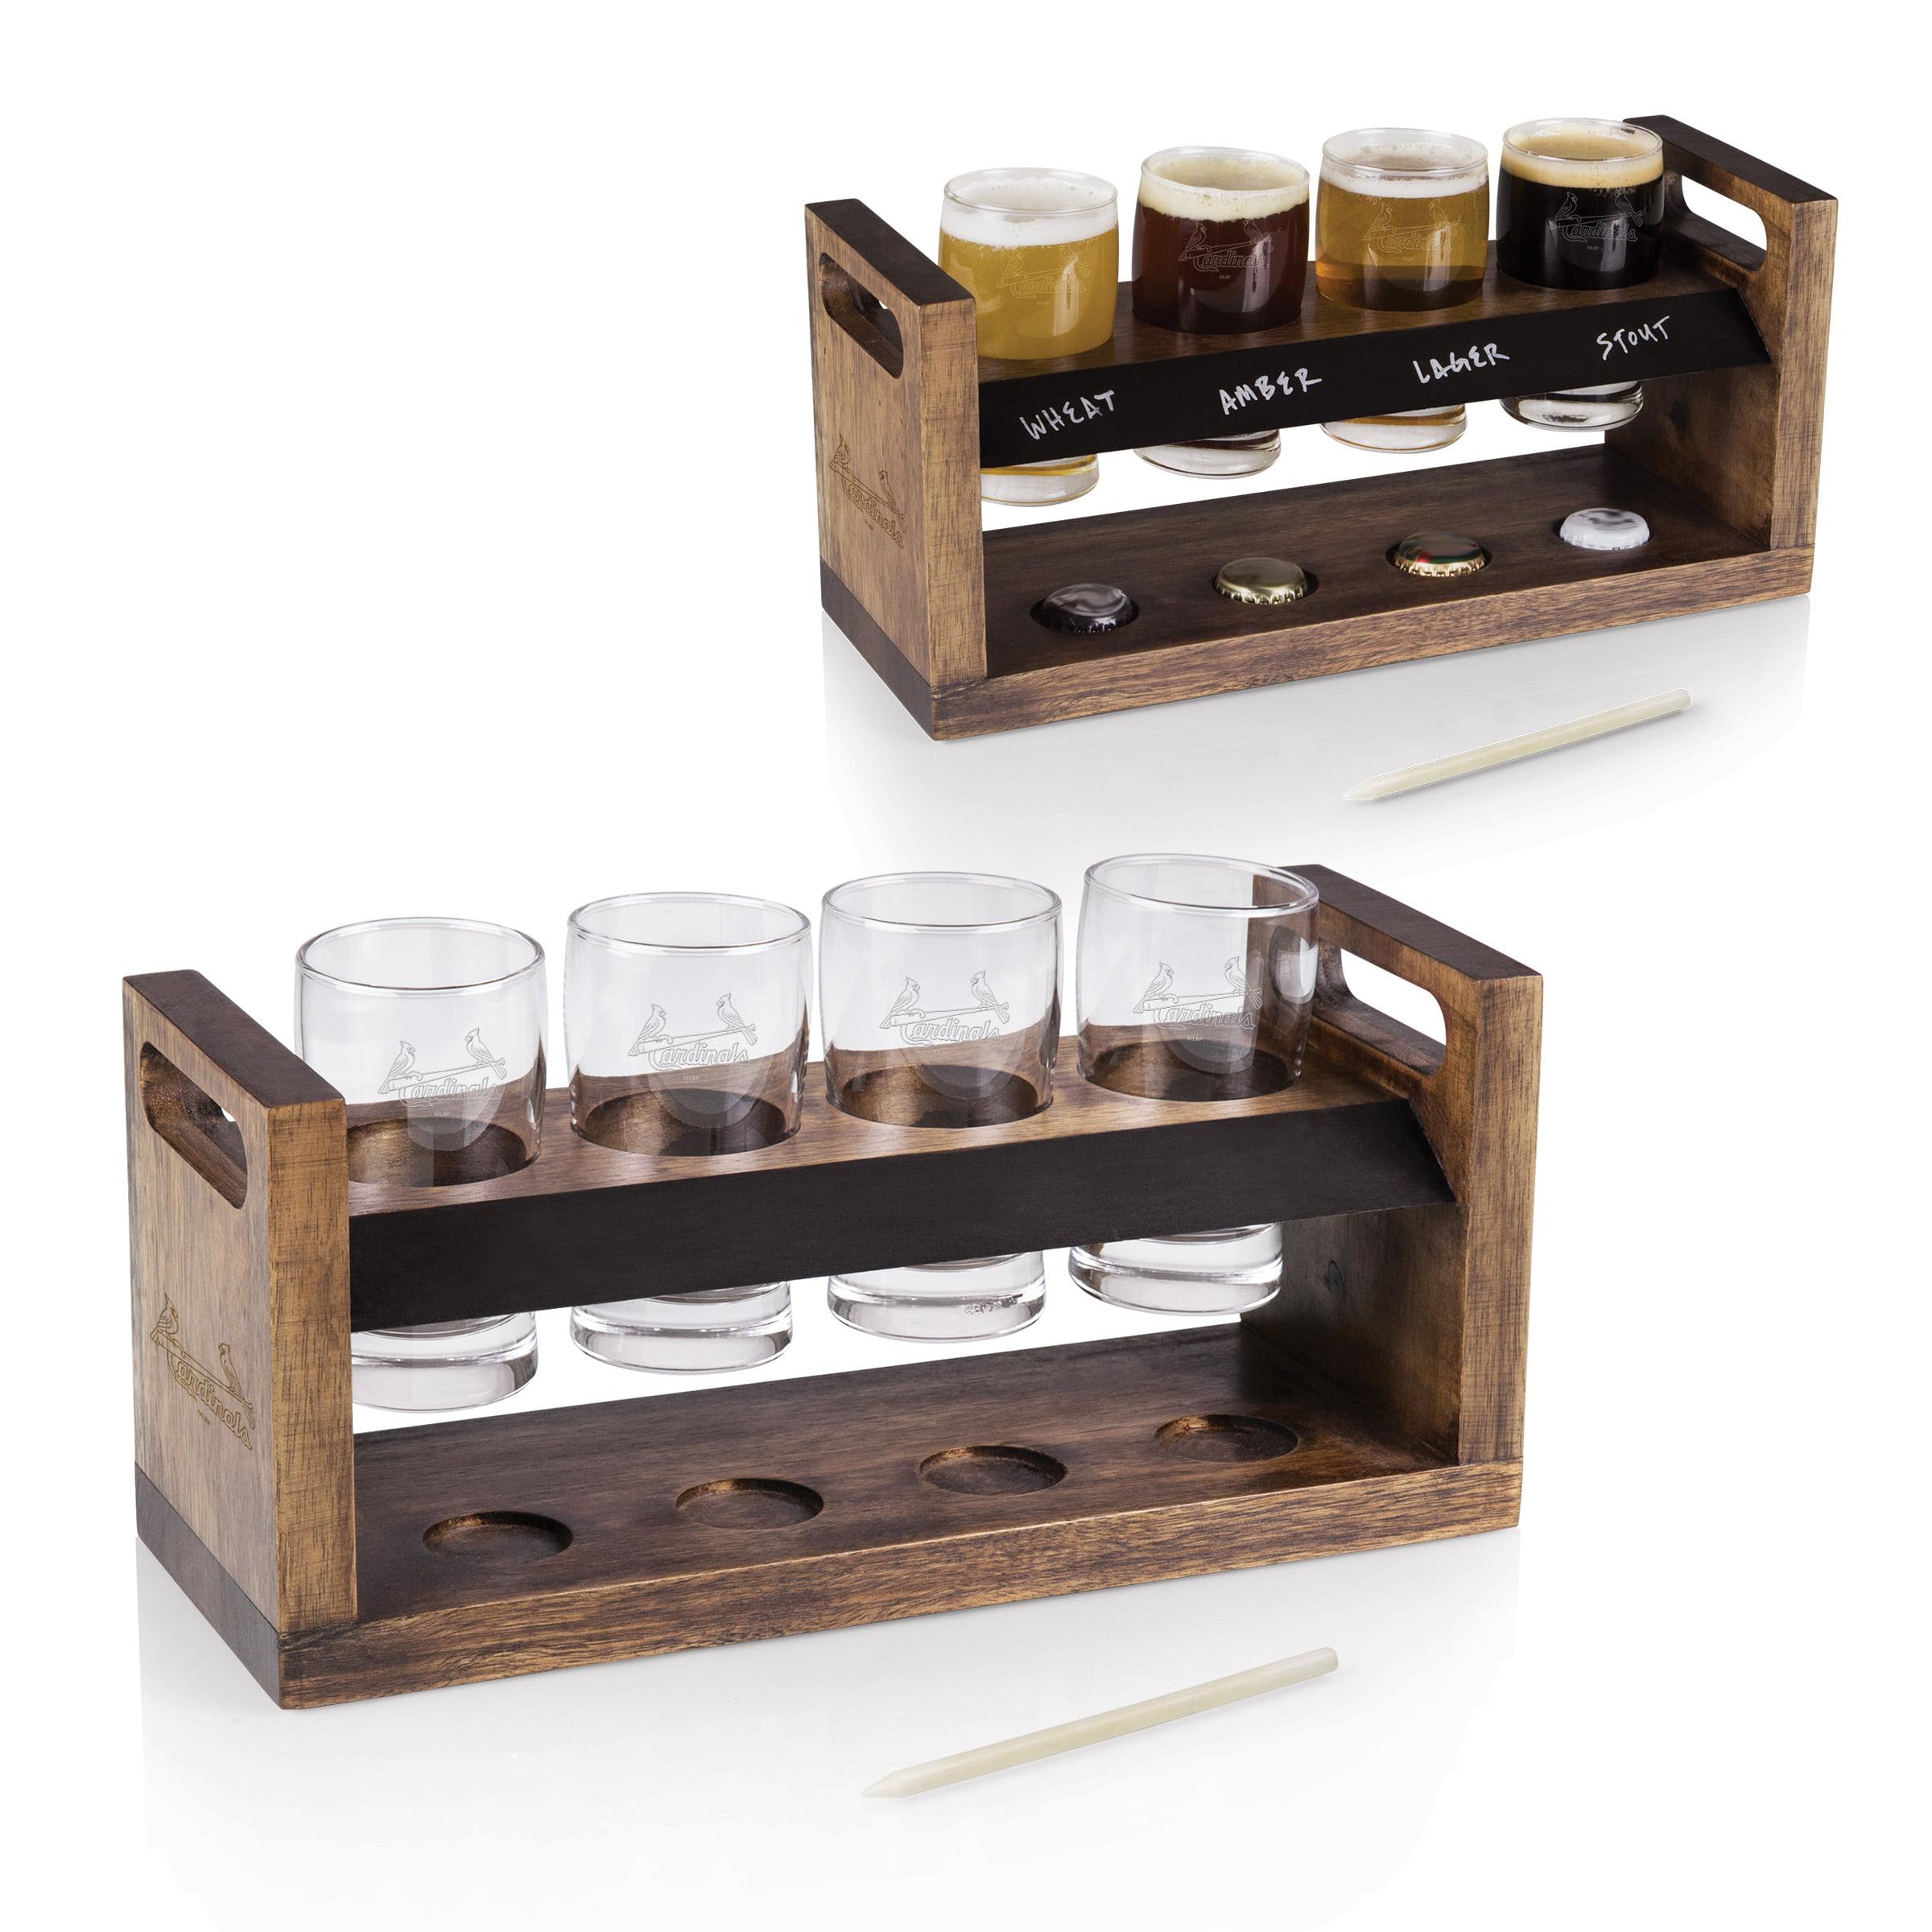 St. Louis Cardinals Craft Beer Flight - Brown - No Size